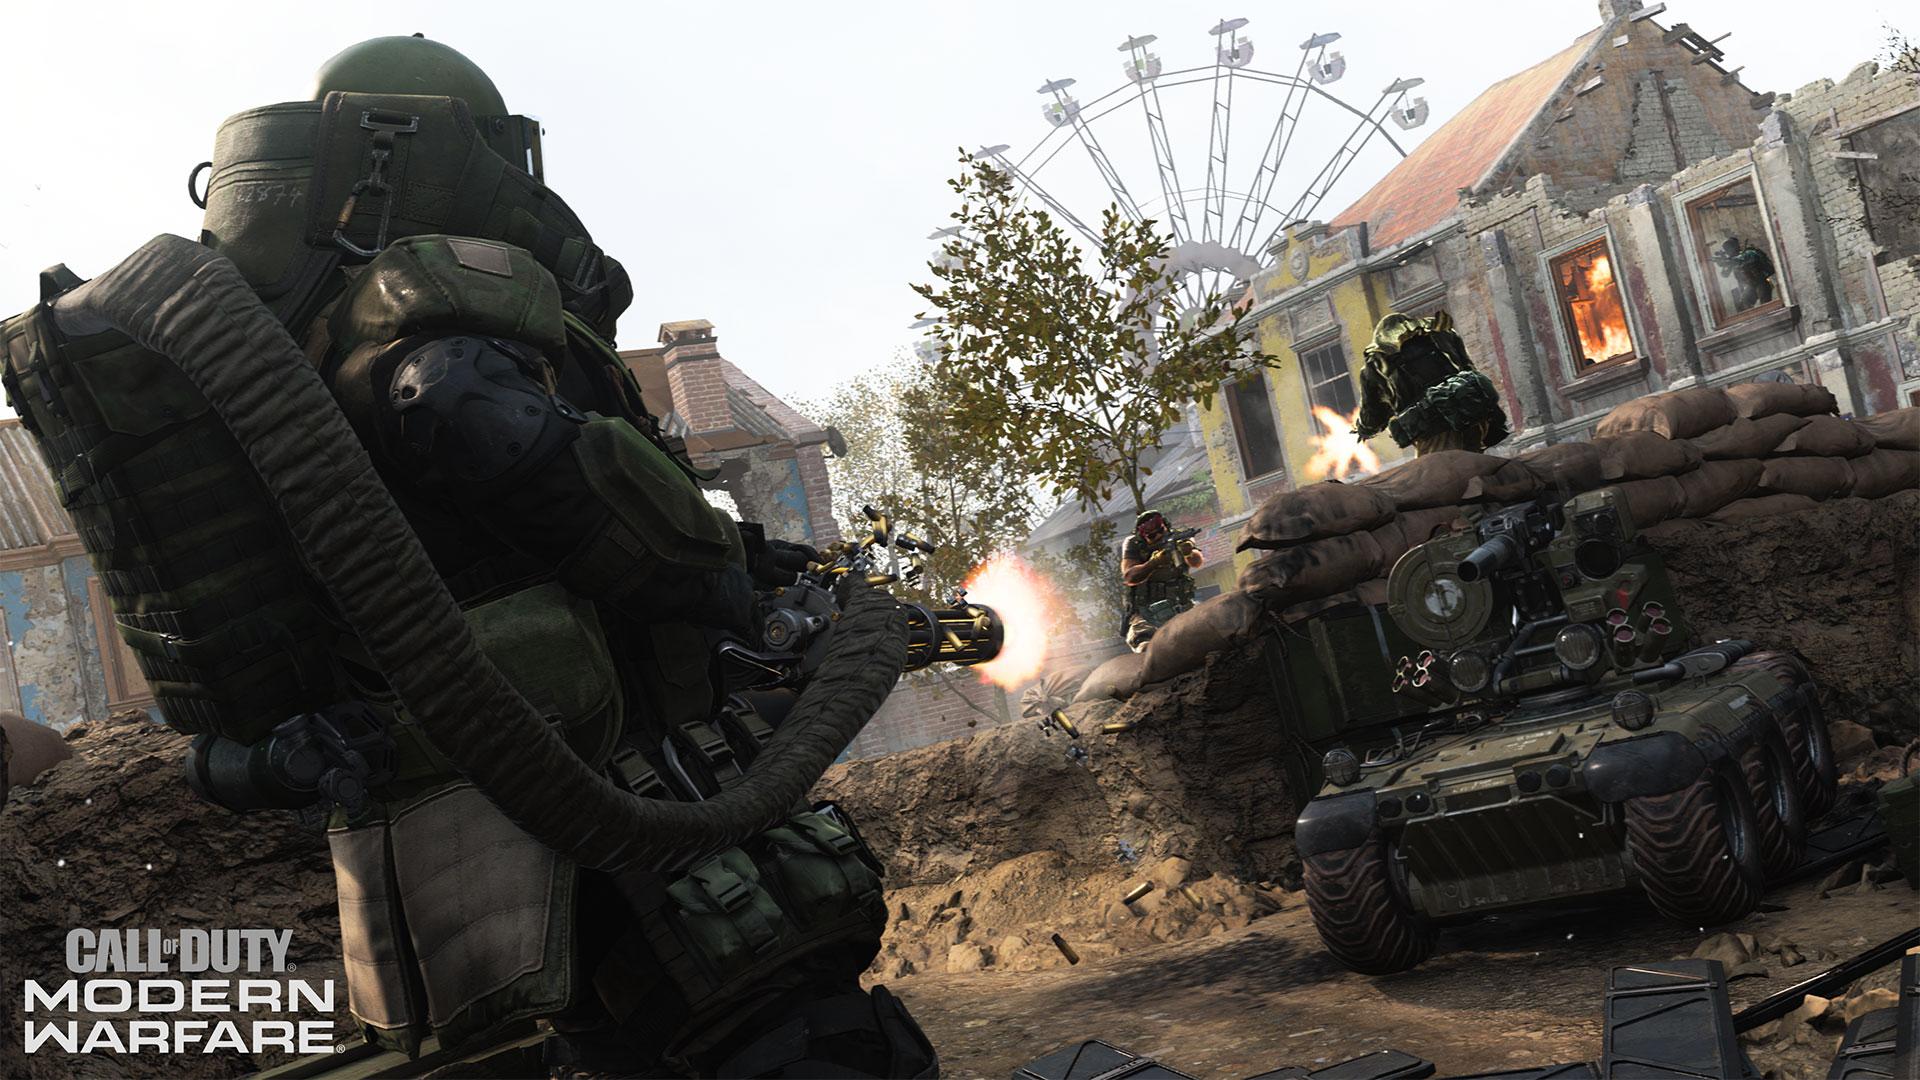 Call of Duty: Modern Warfare junta jogadores das diferentes plataformas no mesmo mapa